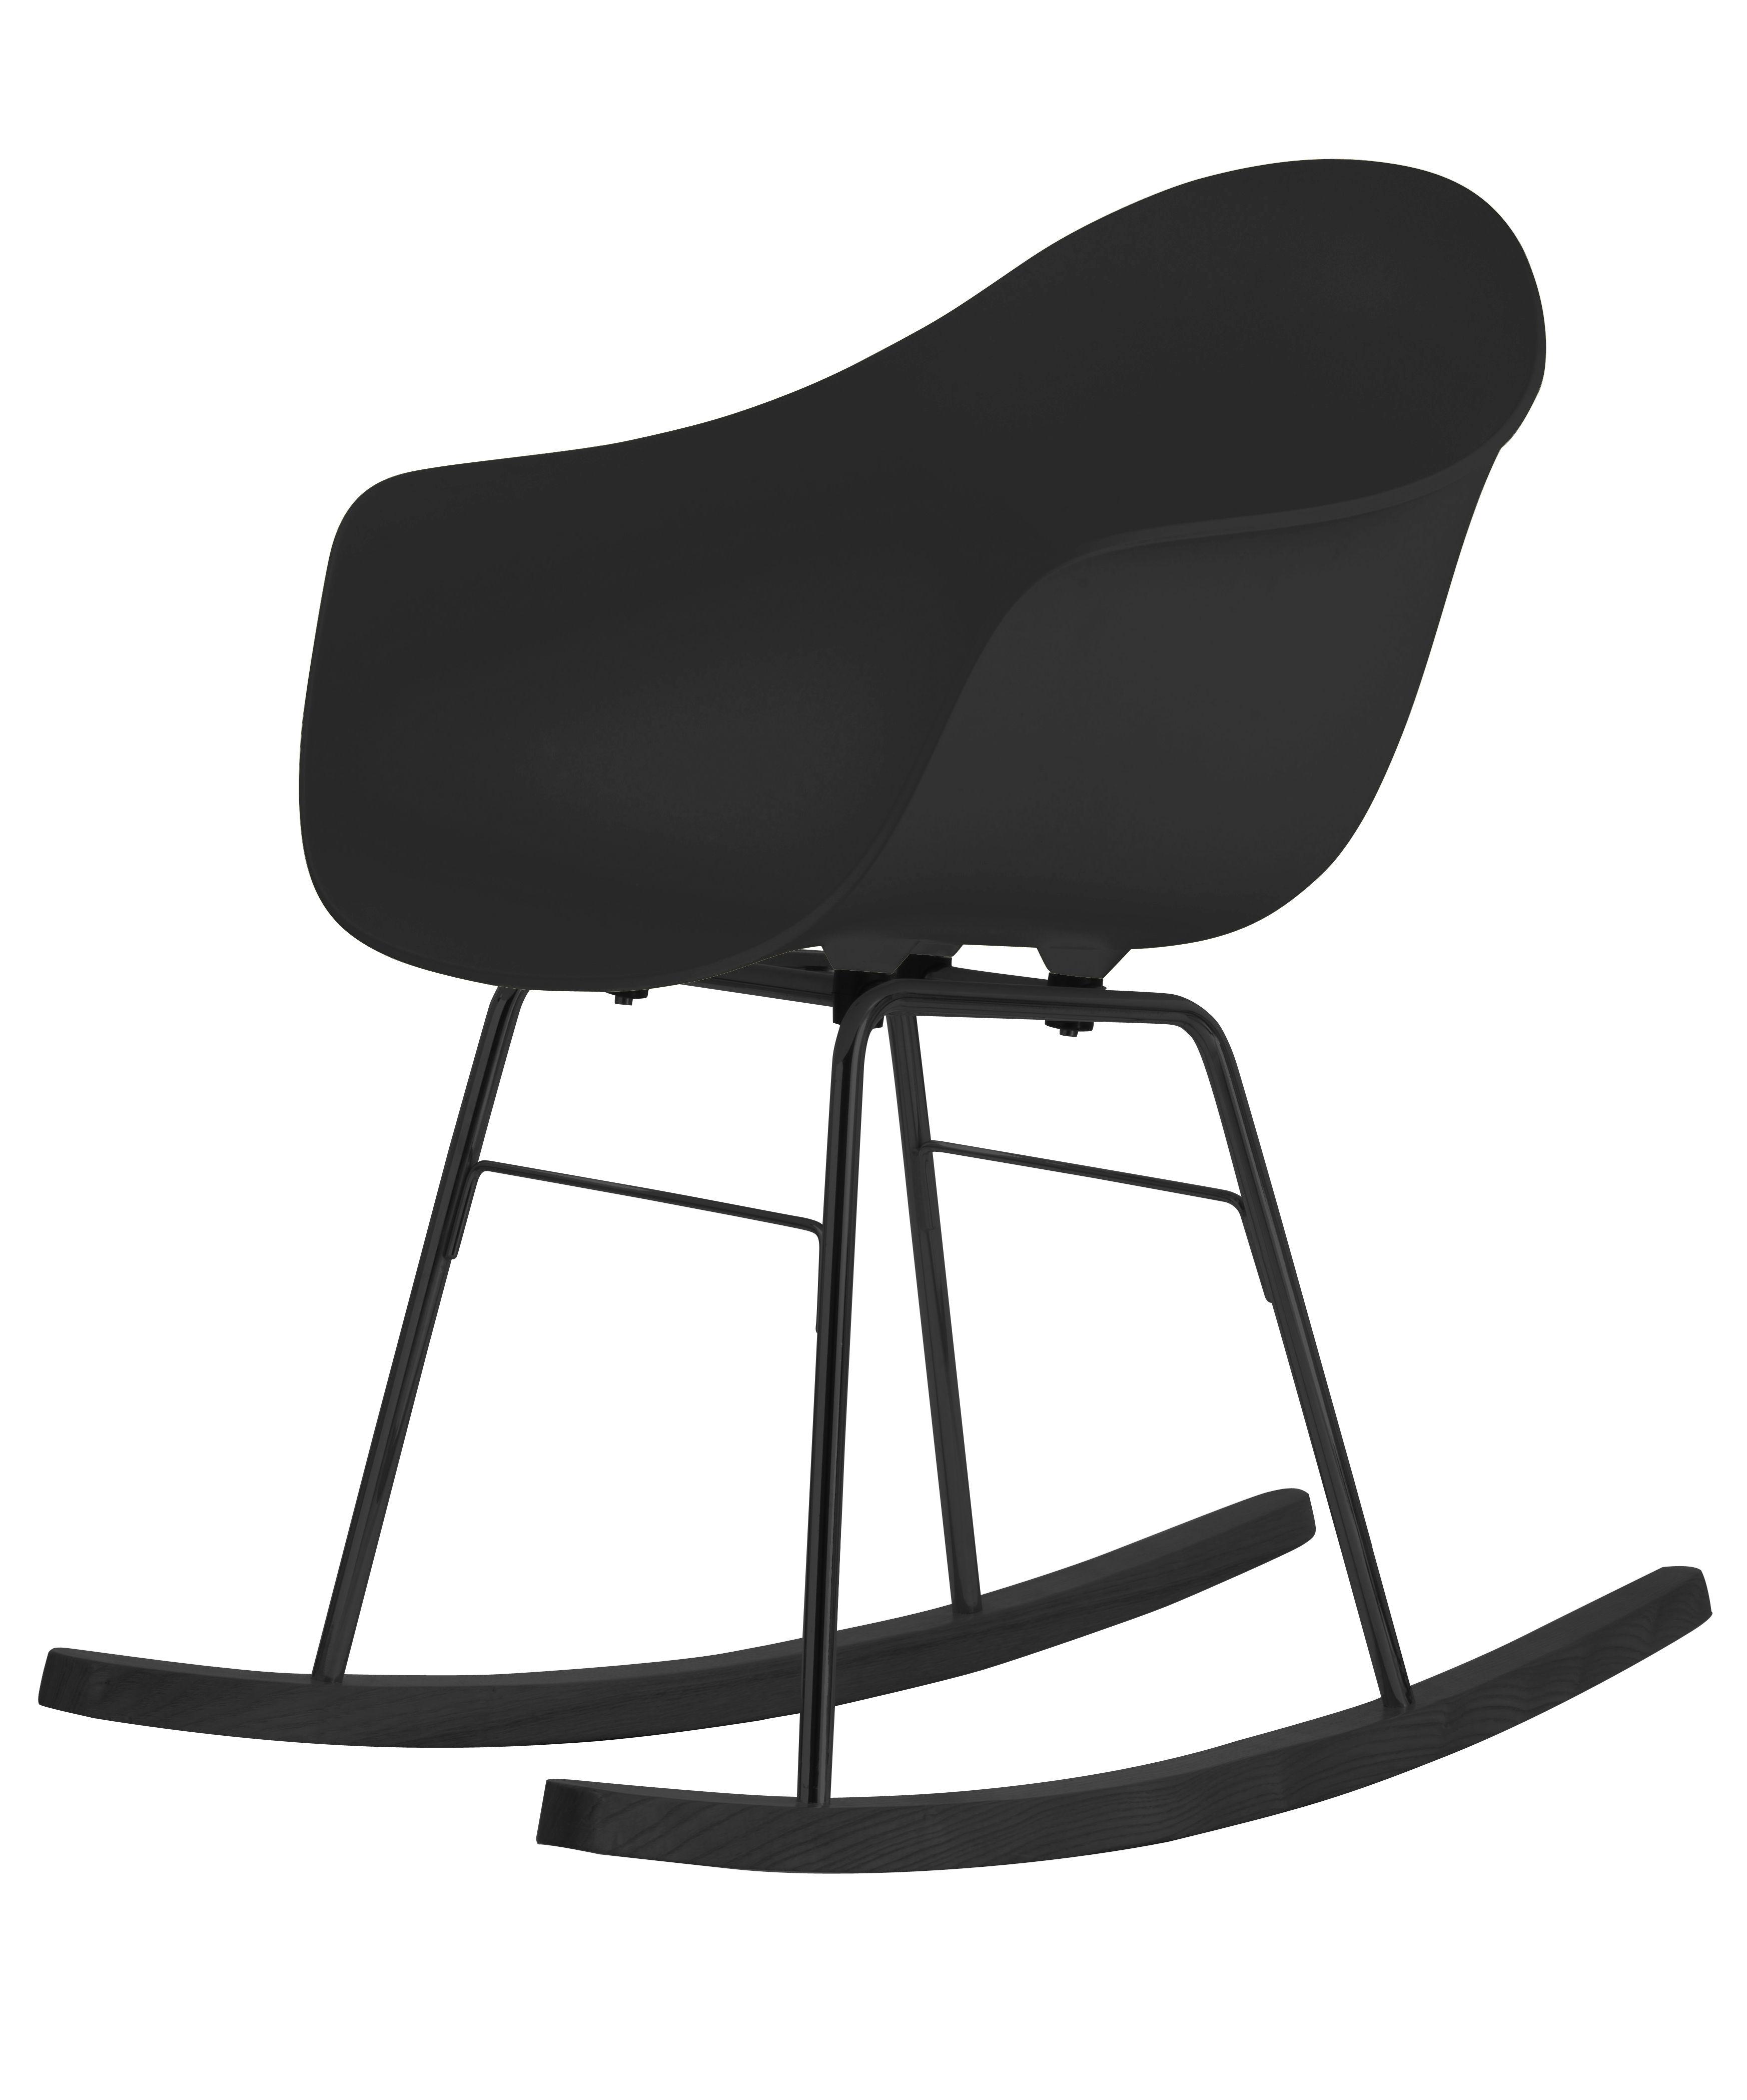 rocking chair ta patins bois noir patins noirs toou. Black Bedroom Furniture Sets. Home Design Ideas